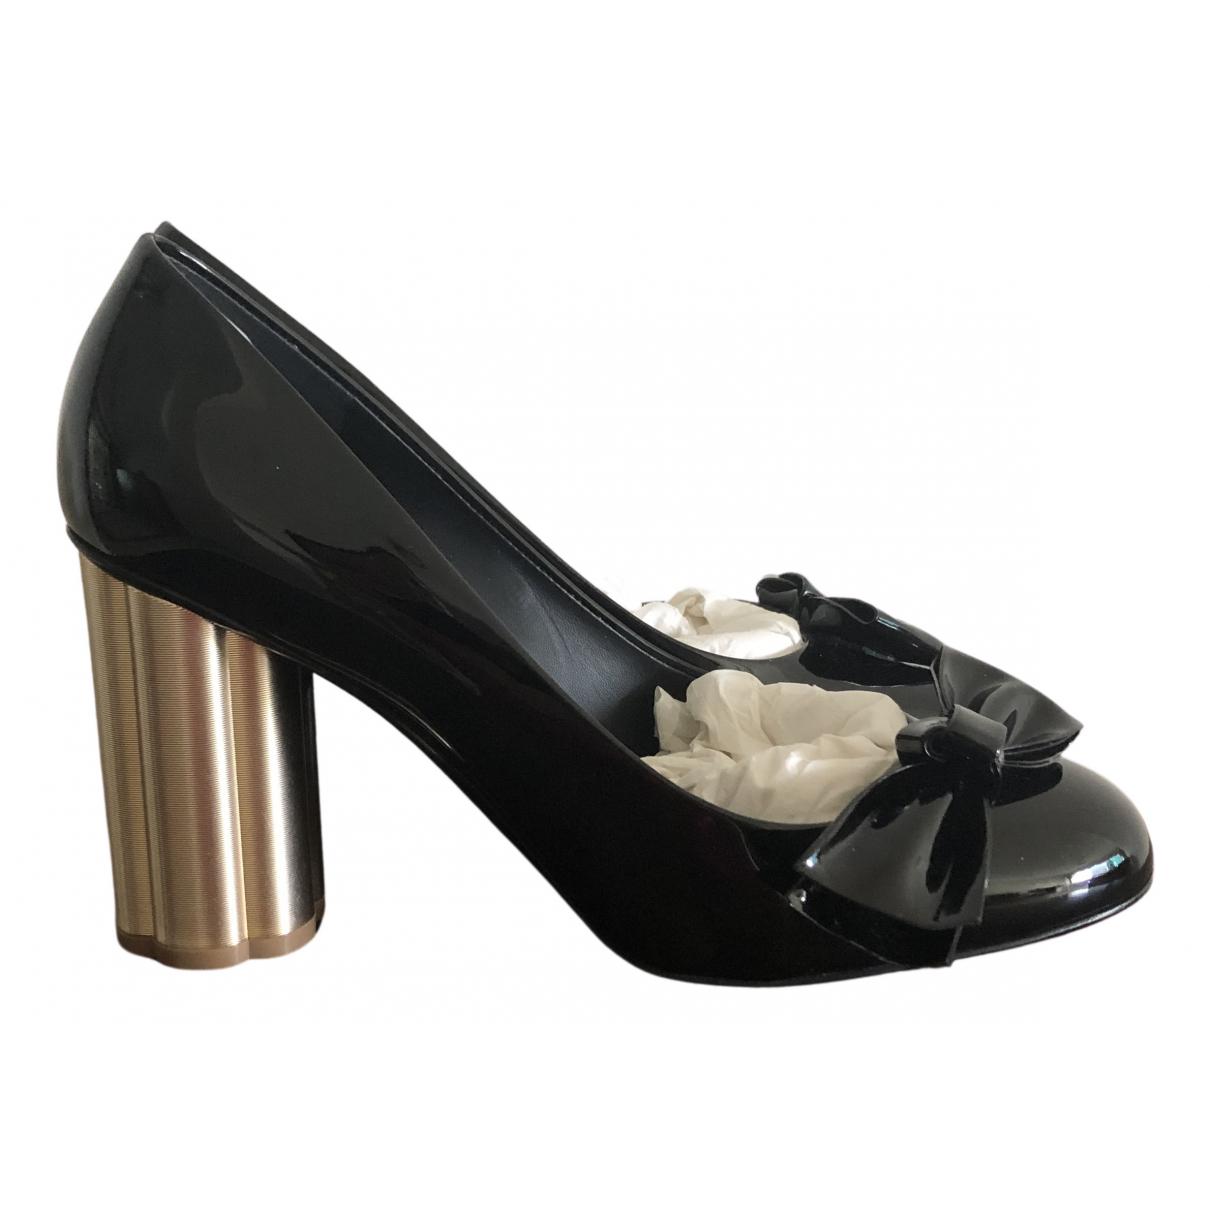 Salvatore Ferragamo N Black Patent leather Heels for Women 9.5 US